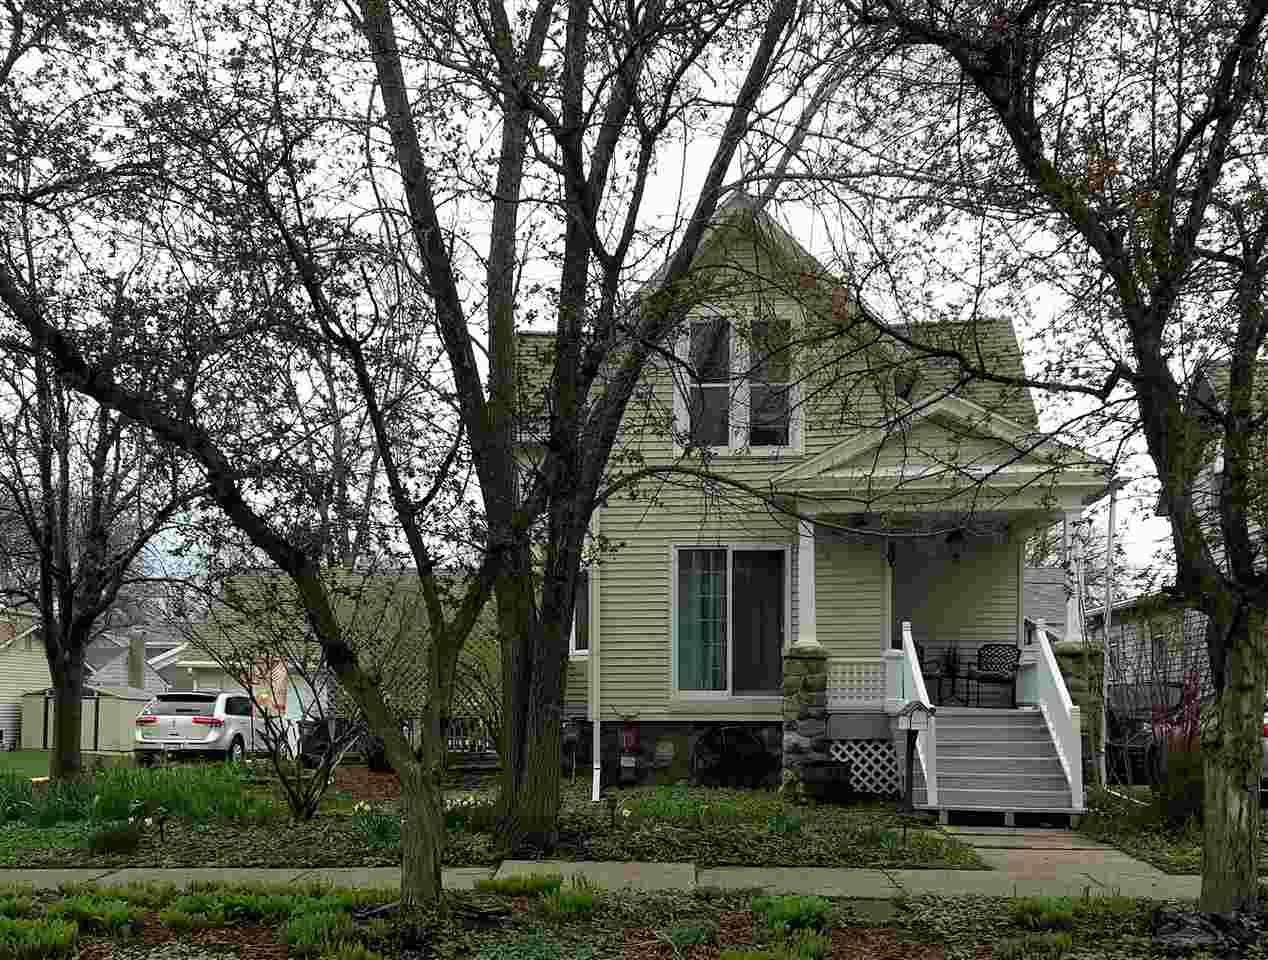 191 E 10TH Street, Fond du Lac, WI 54935 - MLS#: 50238148